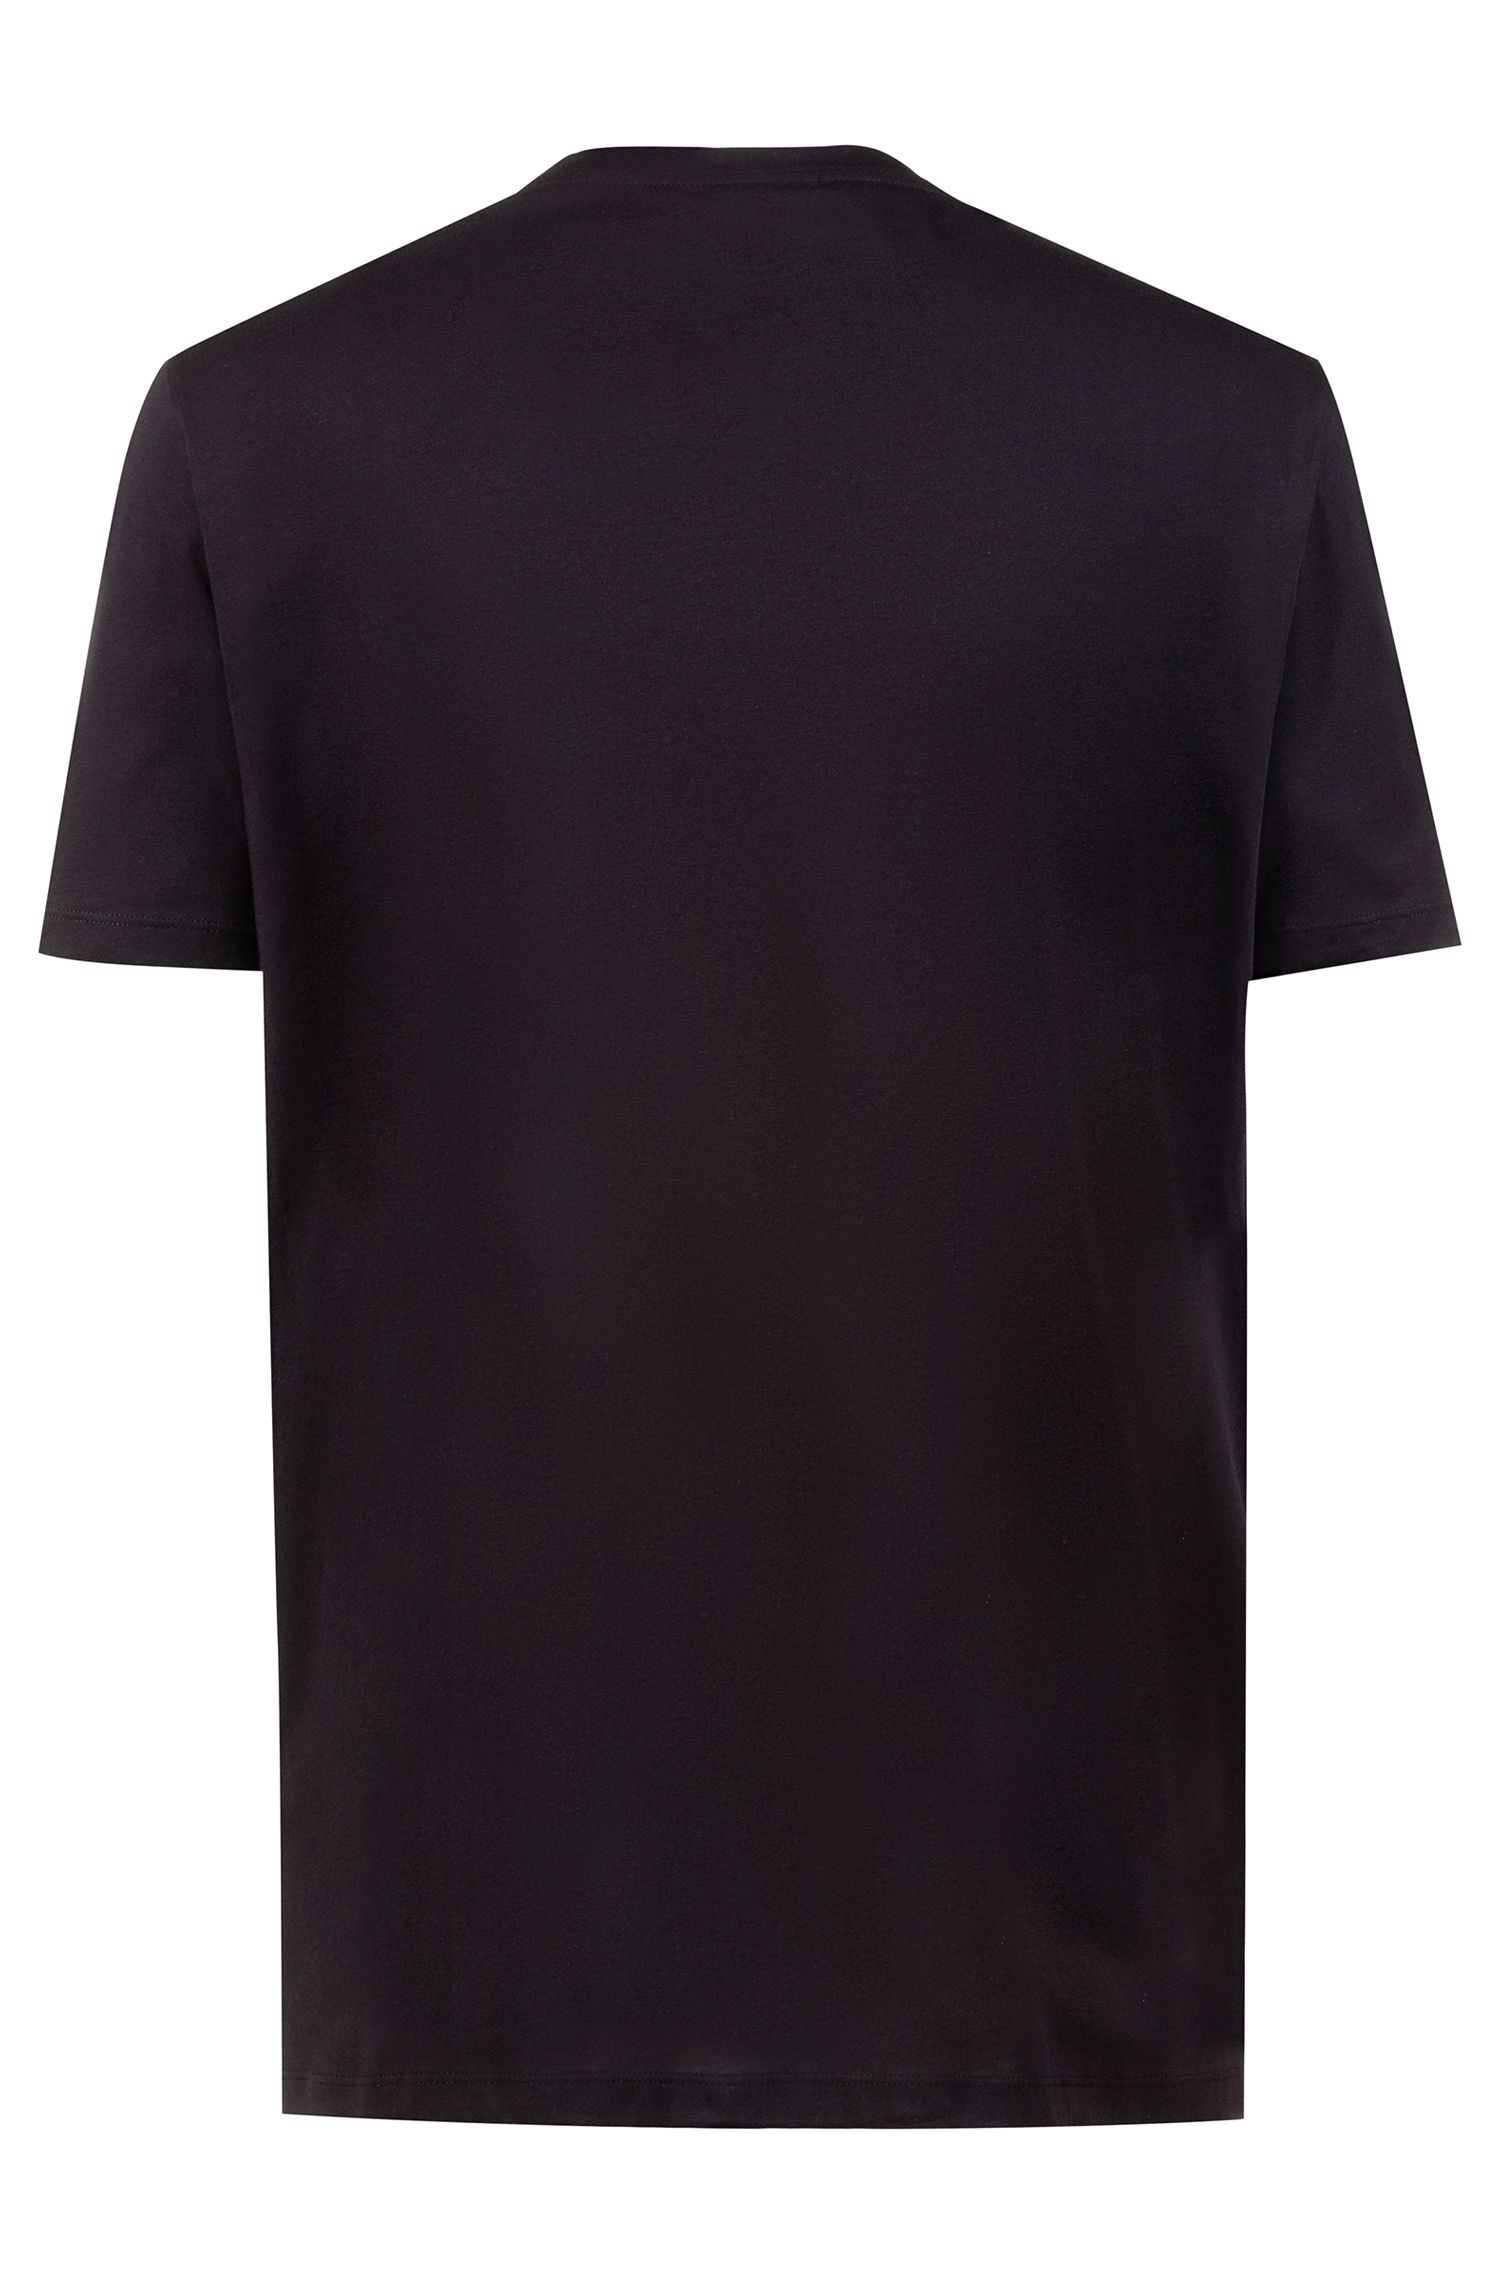 Relaxed-Fit T-Shirt mit Grafik-Logo, Schwarz